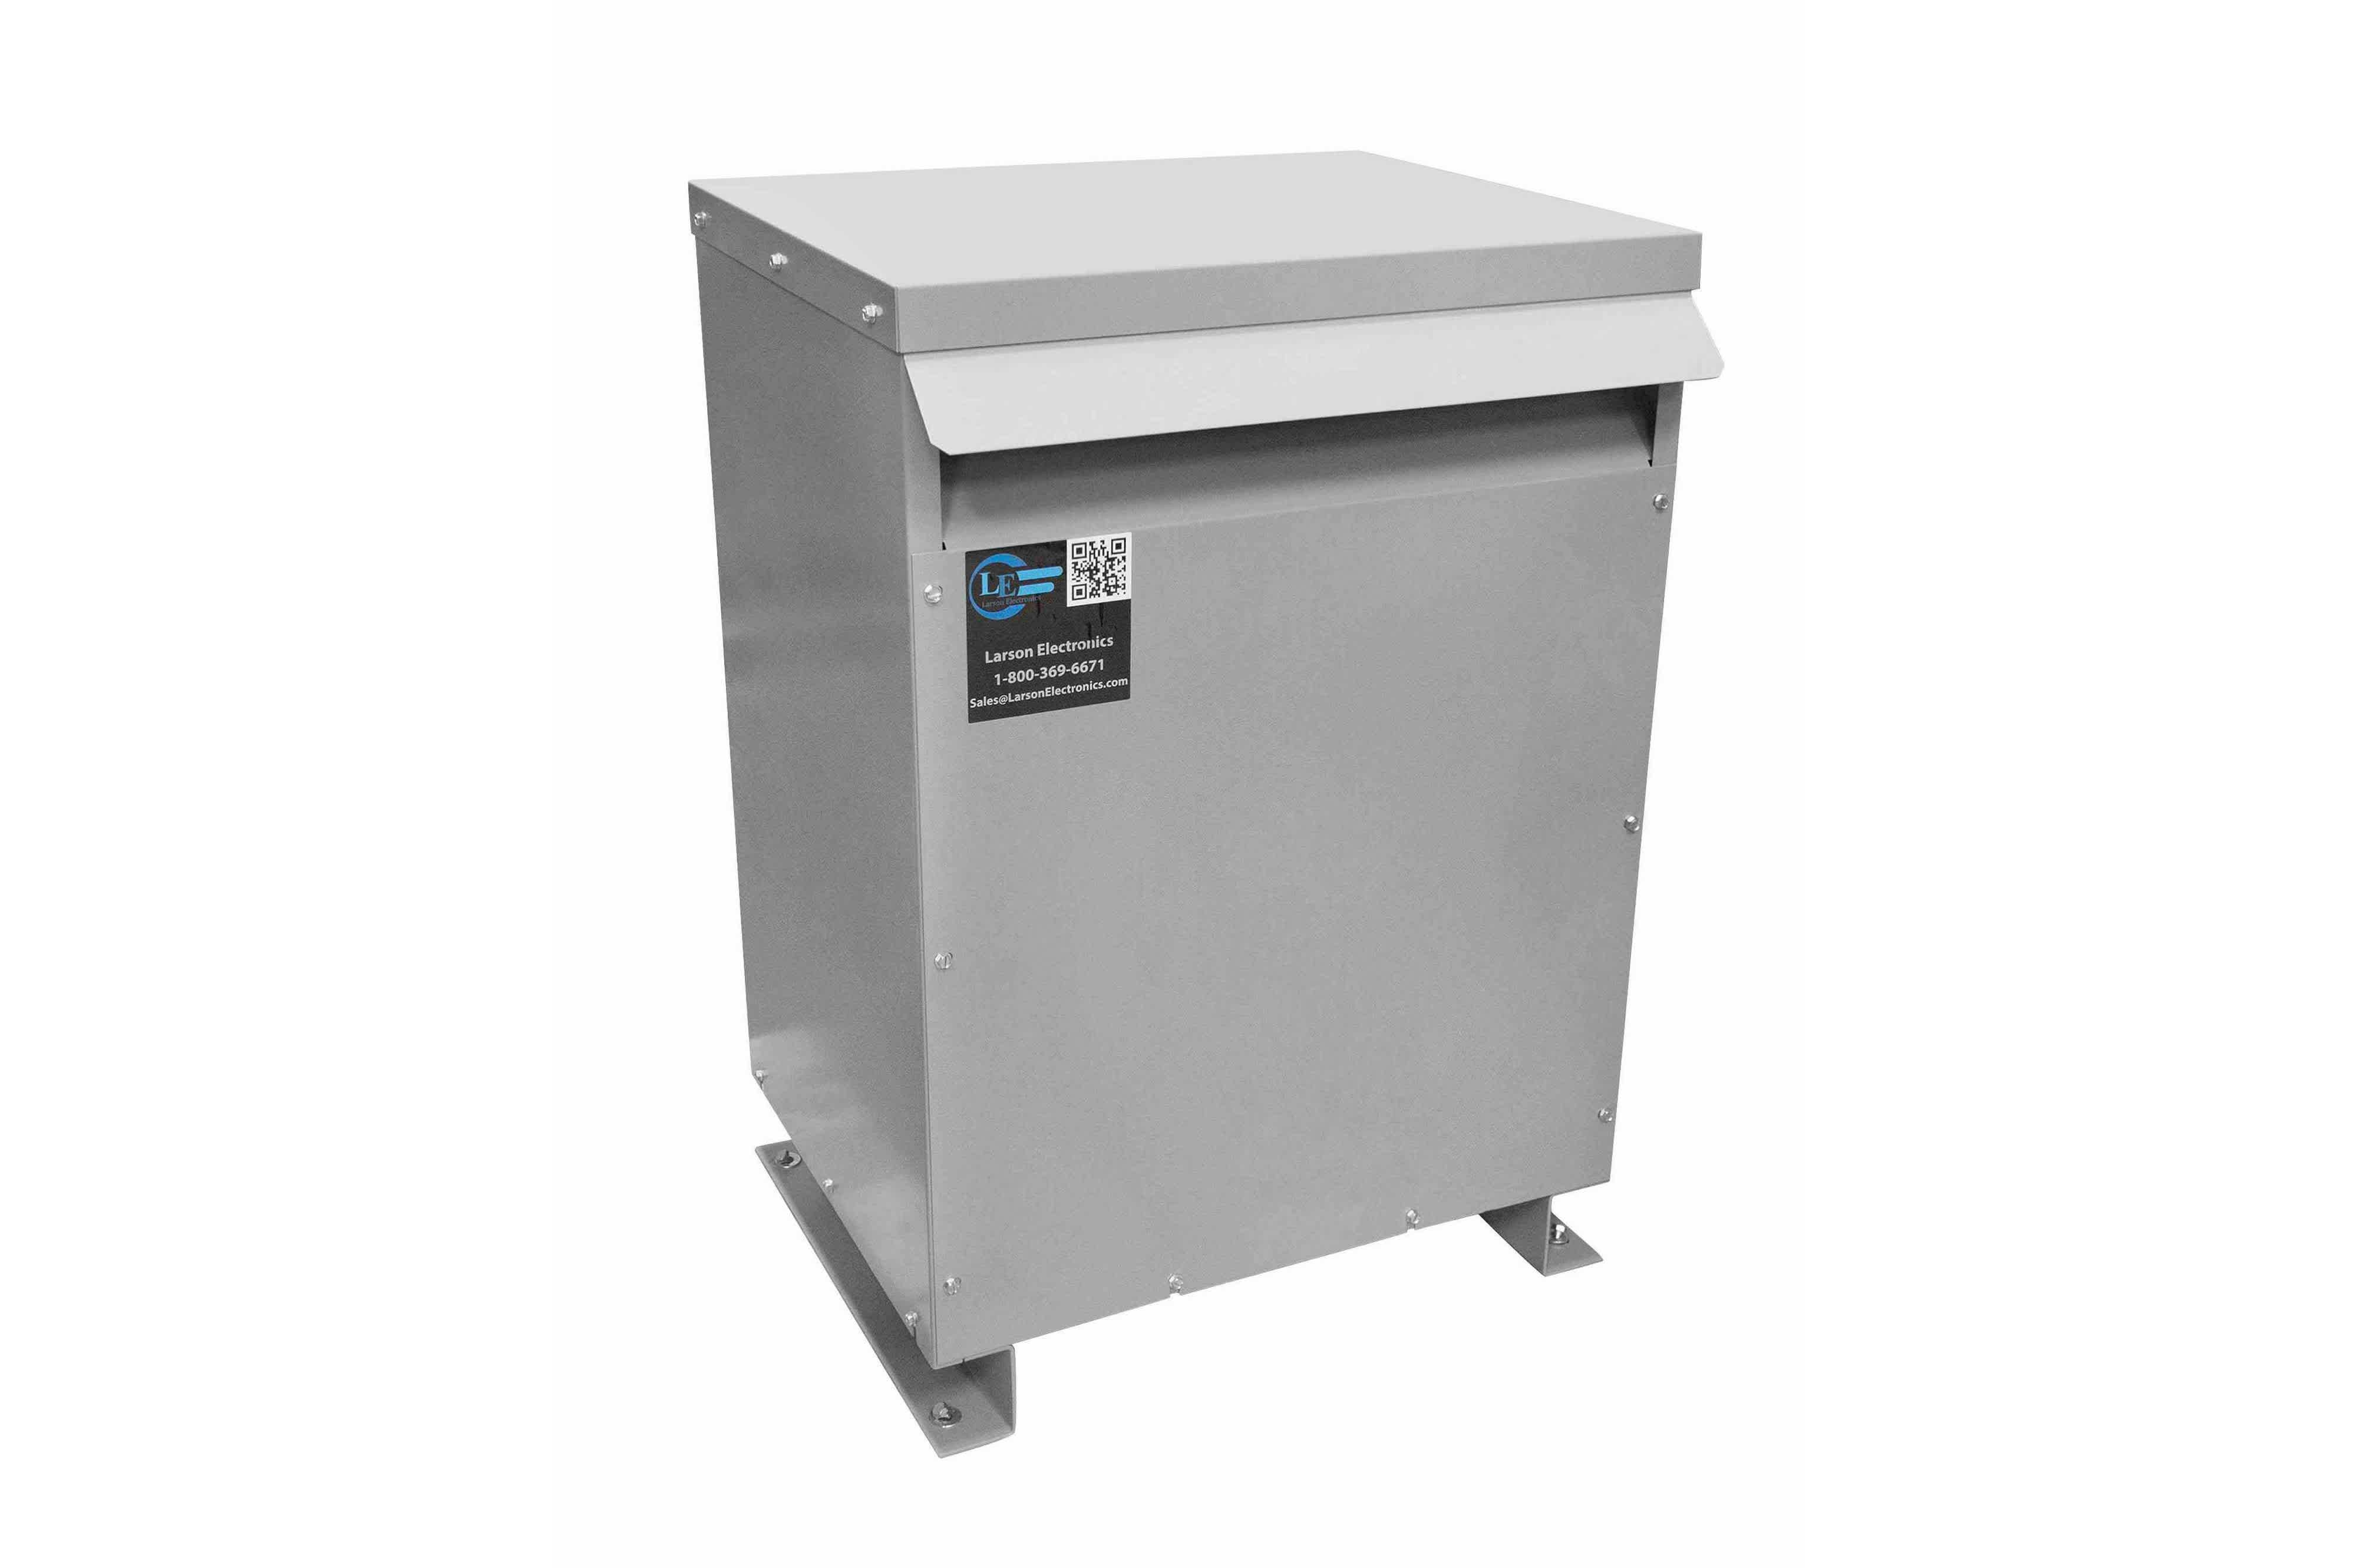 38 kVA 3PH Isolation Transformer, 400V Wye Primary, 208V Delta Secondary, N3R, Ventilated, 60 Hz